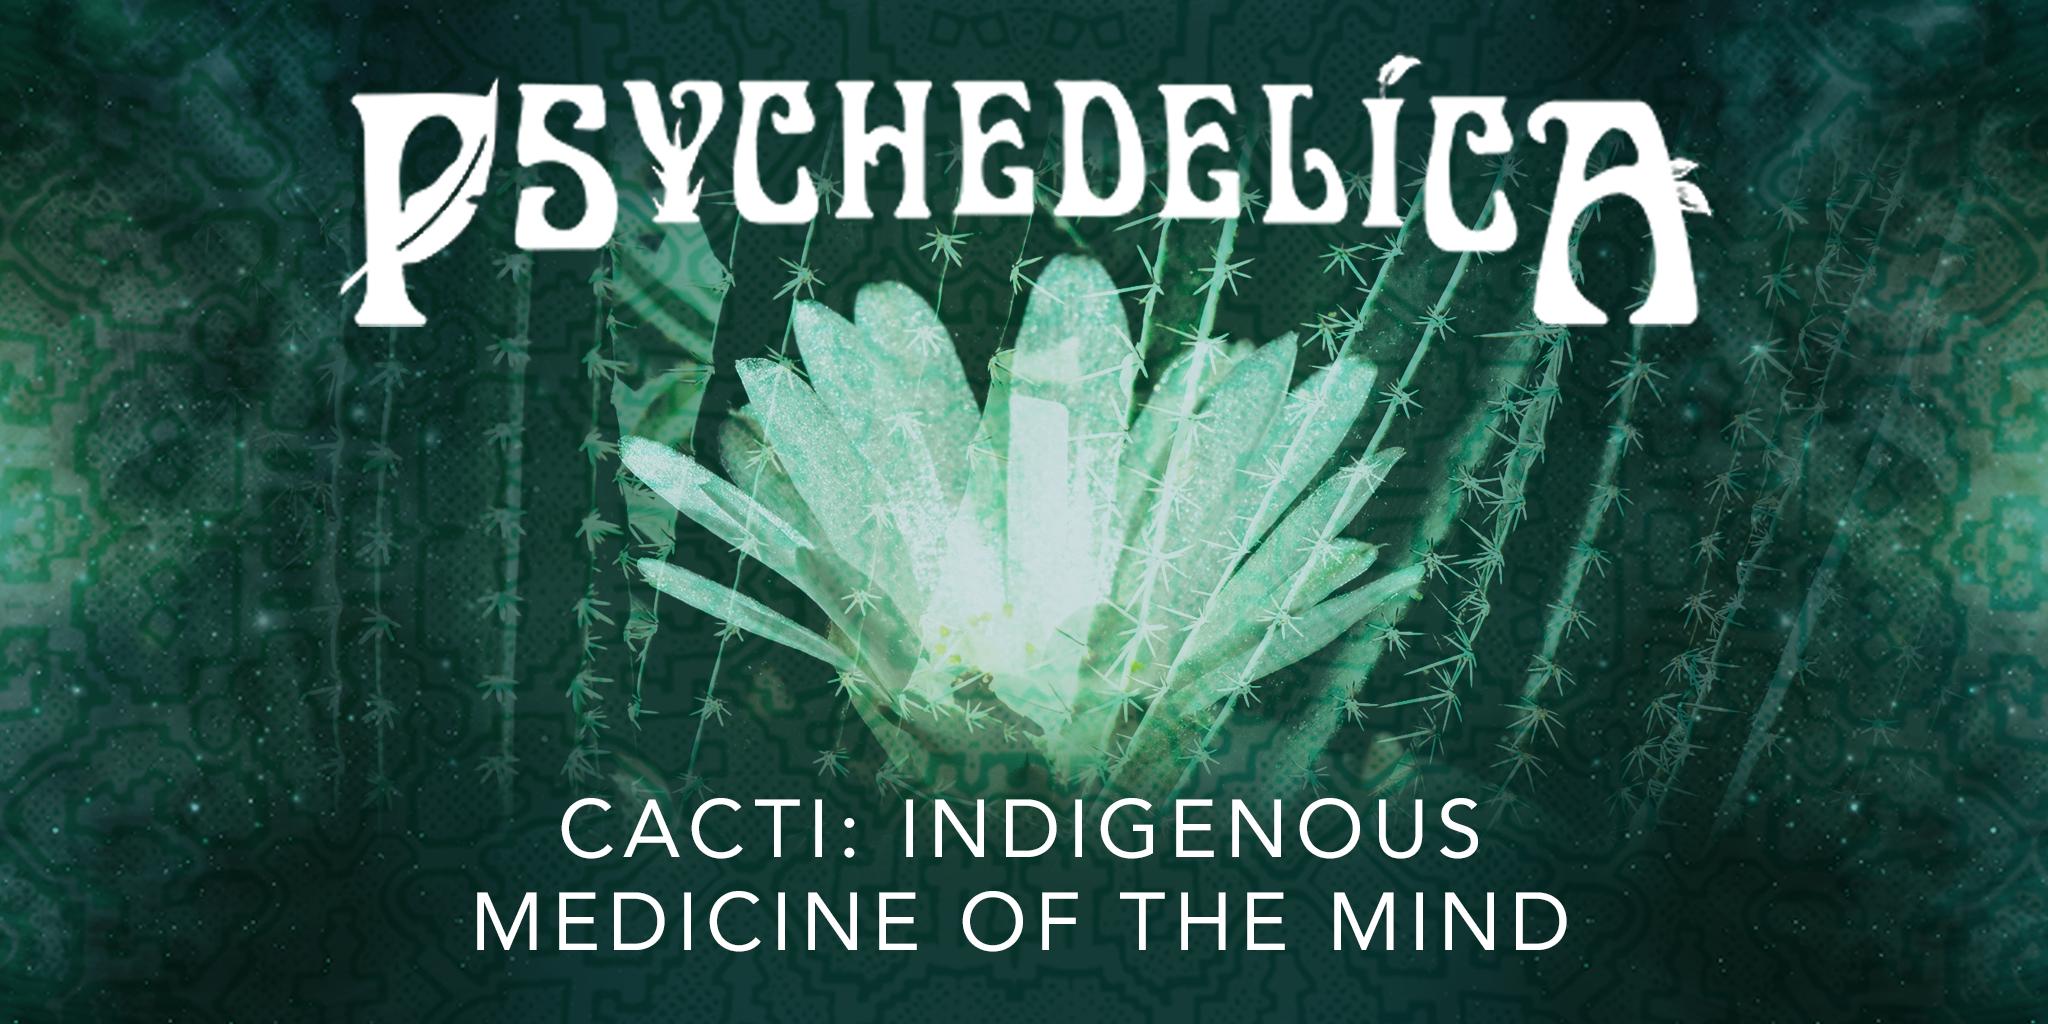 169851_p_e6_cacti_indigenous-medicine-of-the-mind_2048x1024.jpg